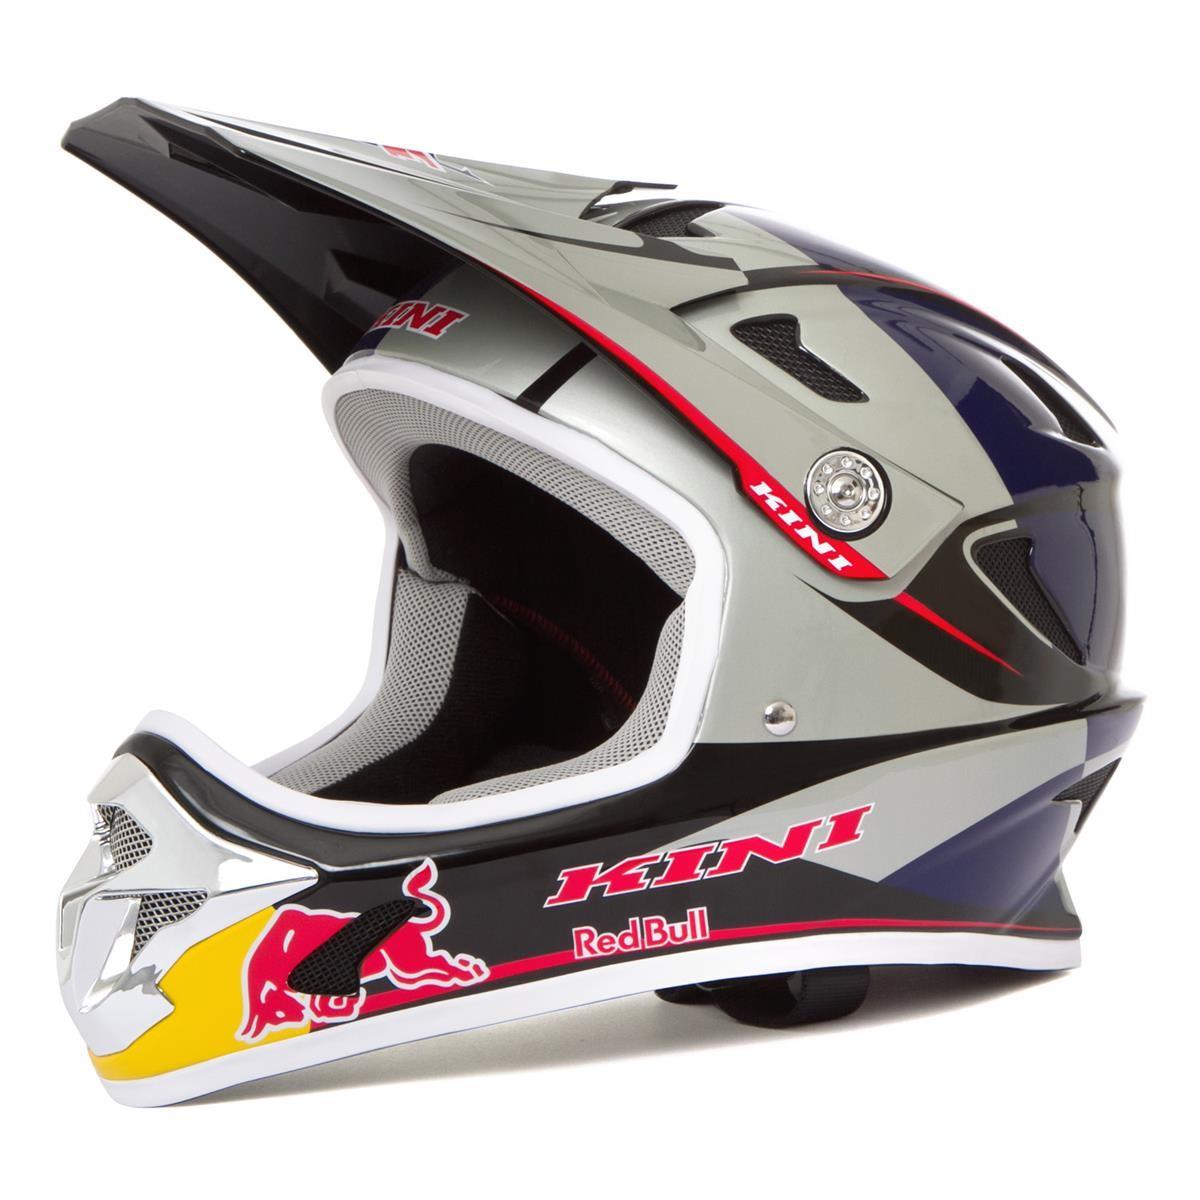 Kini Red Bull Downhill-MTB Helm MTB Silber/Blau 151086626 317